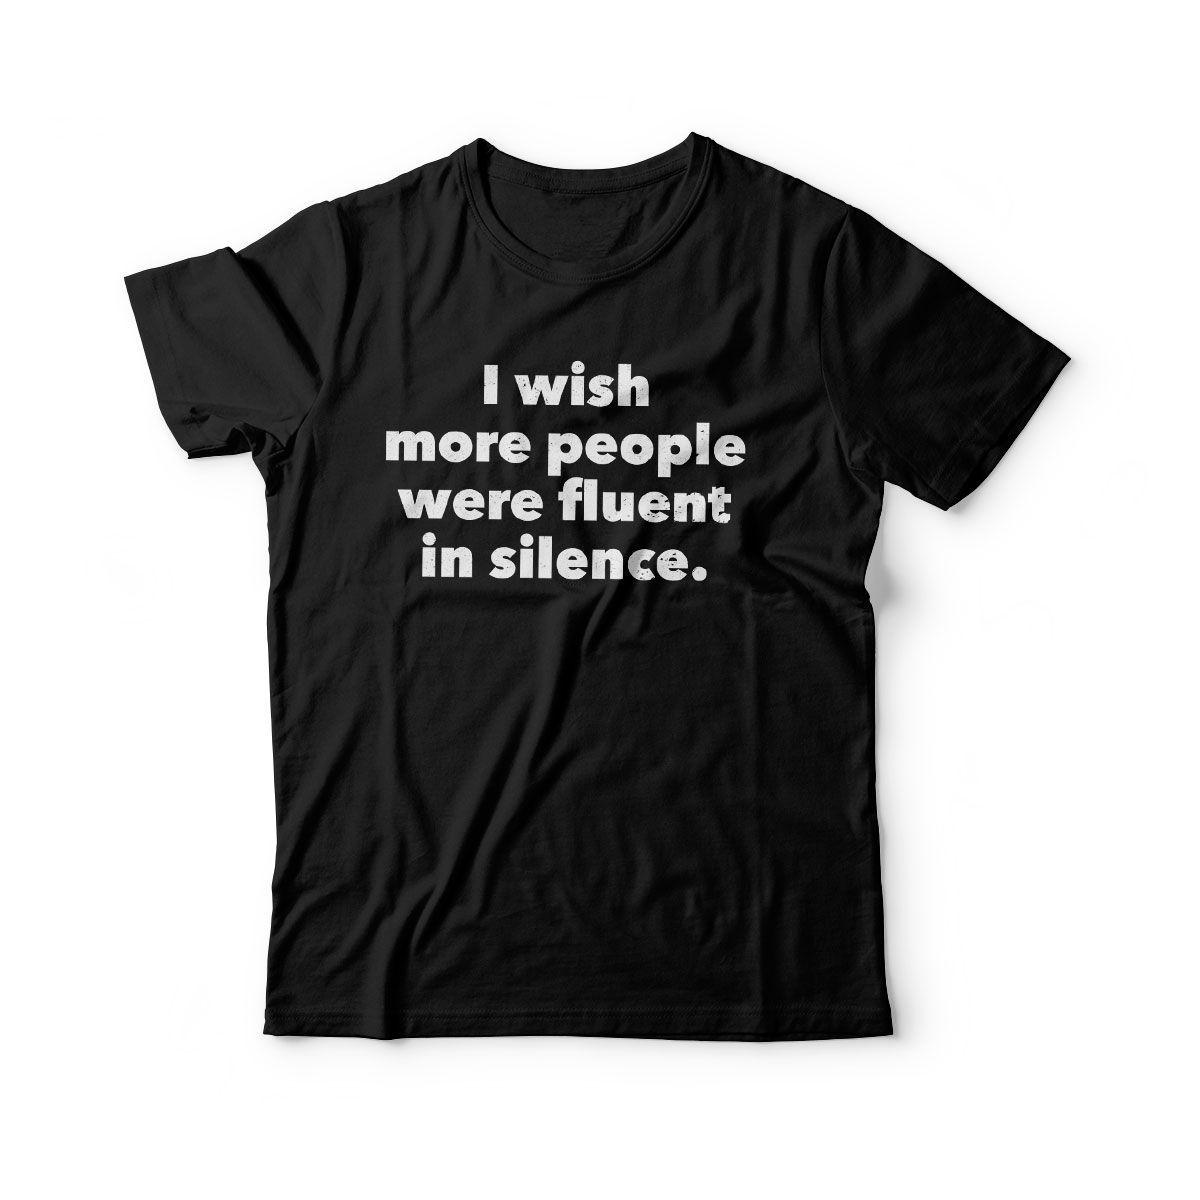 camiseta infantil com frase ironica